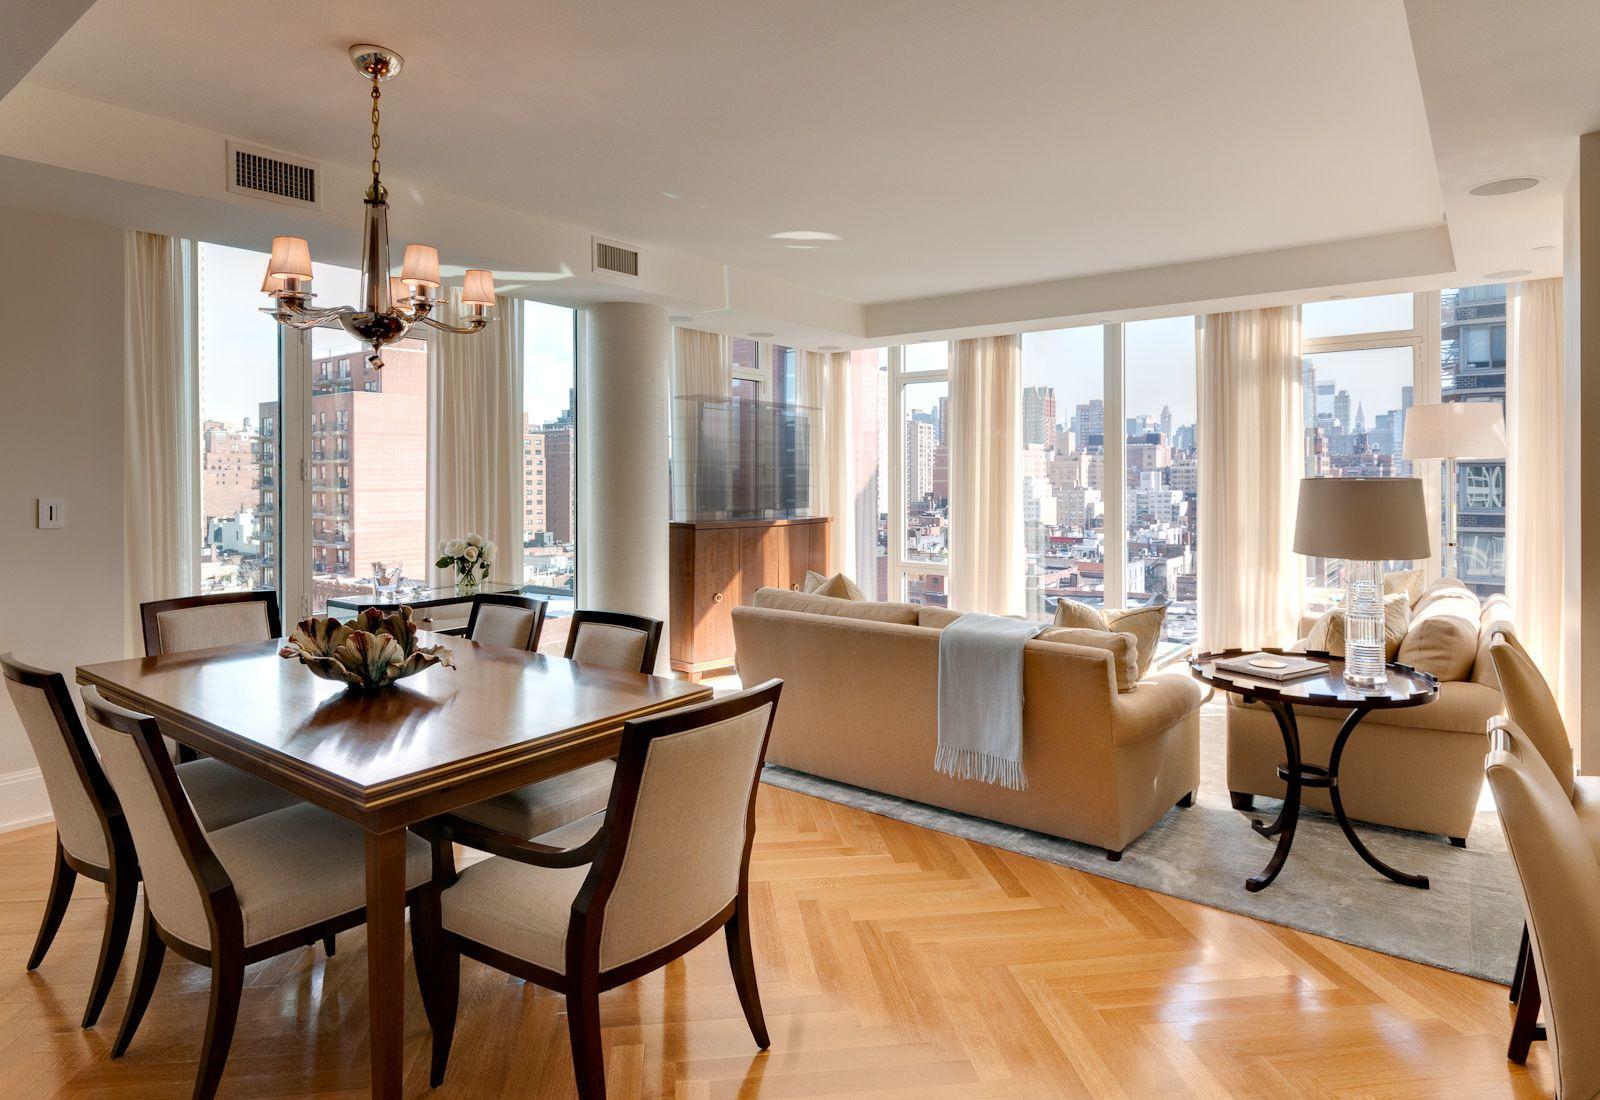 decorate a dining room home decorating ideas pinterest living rh pinterest com